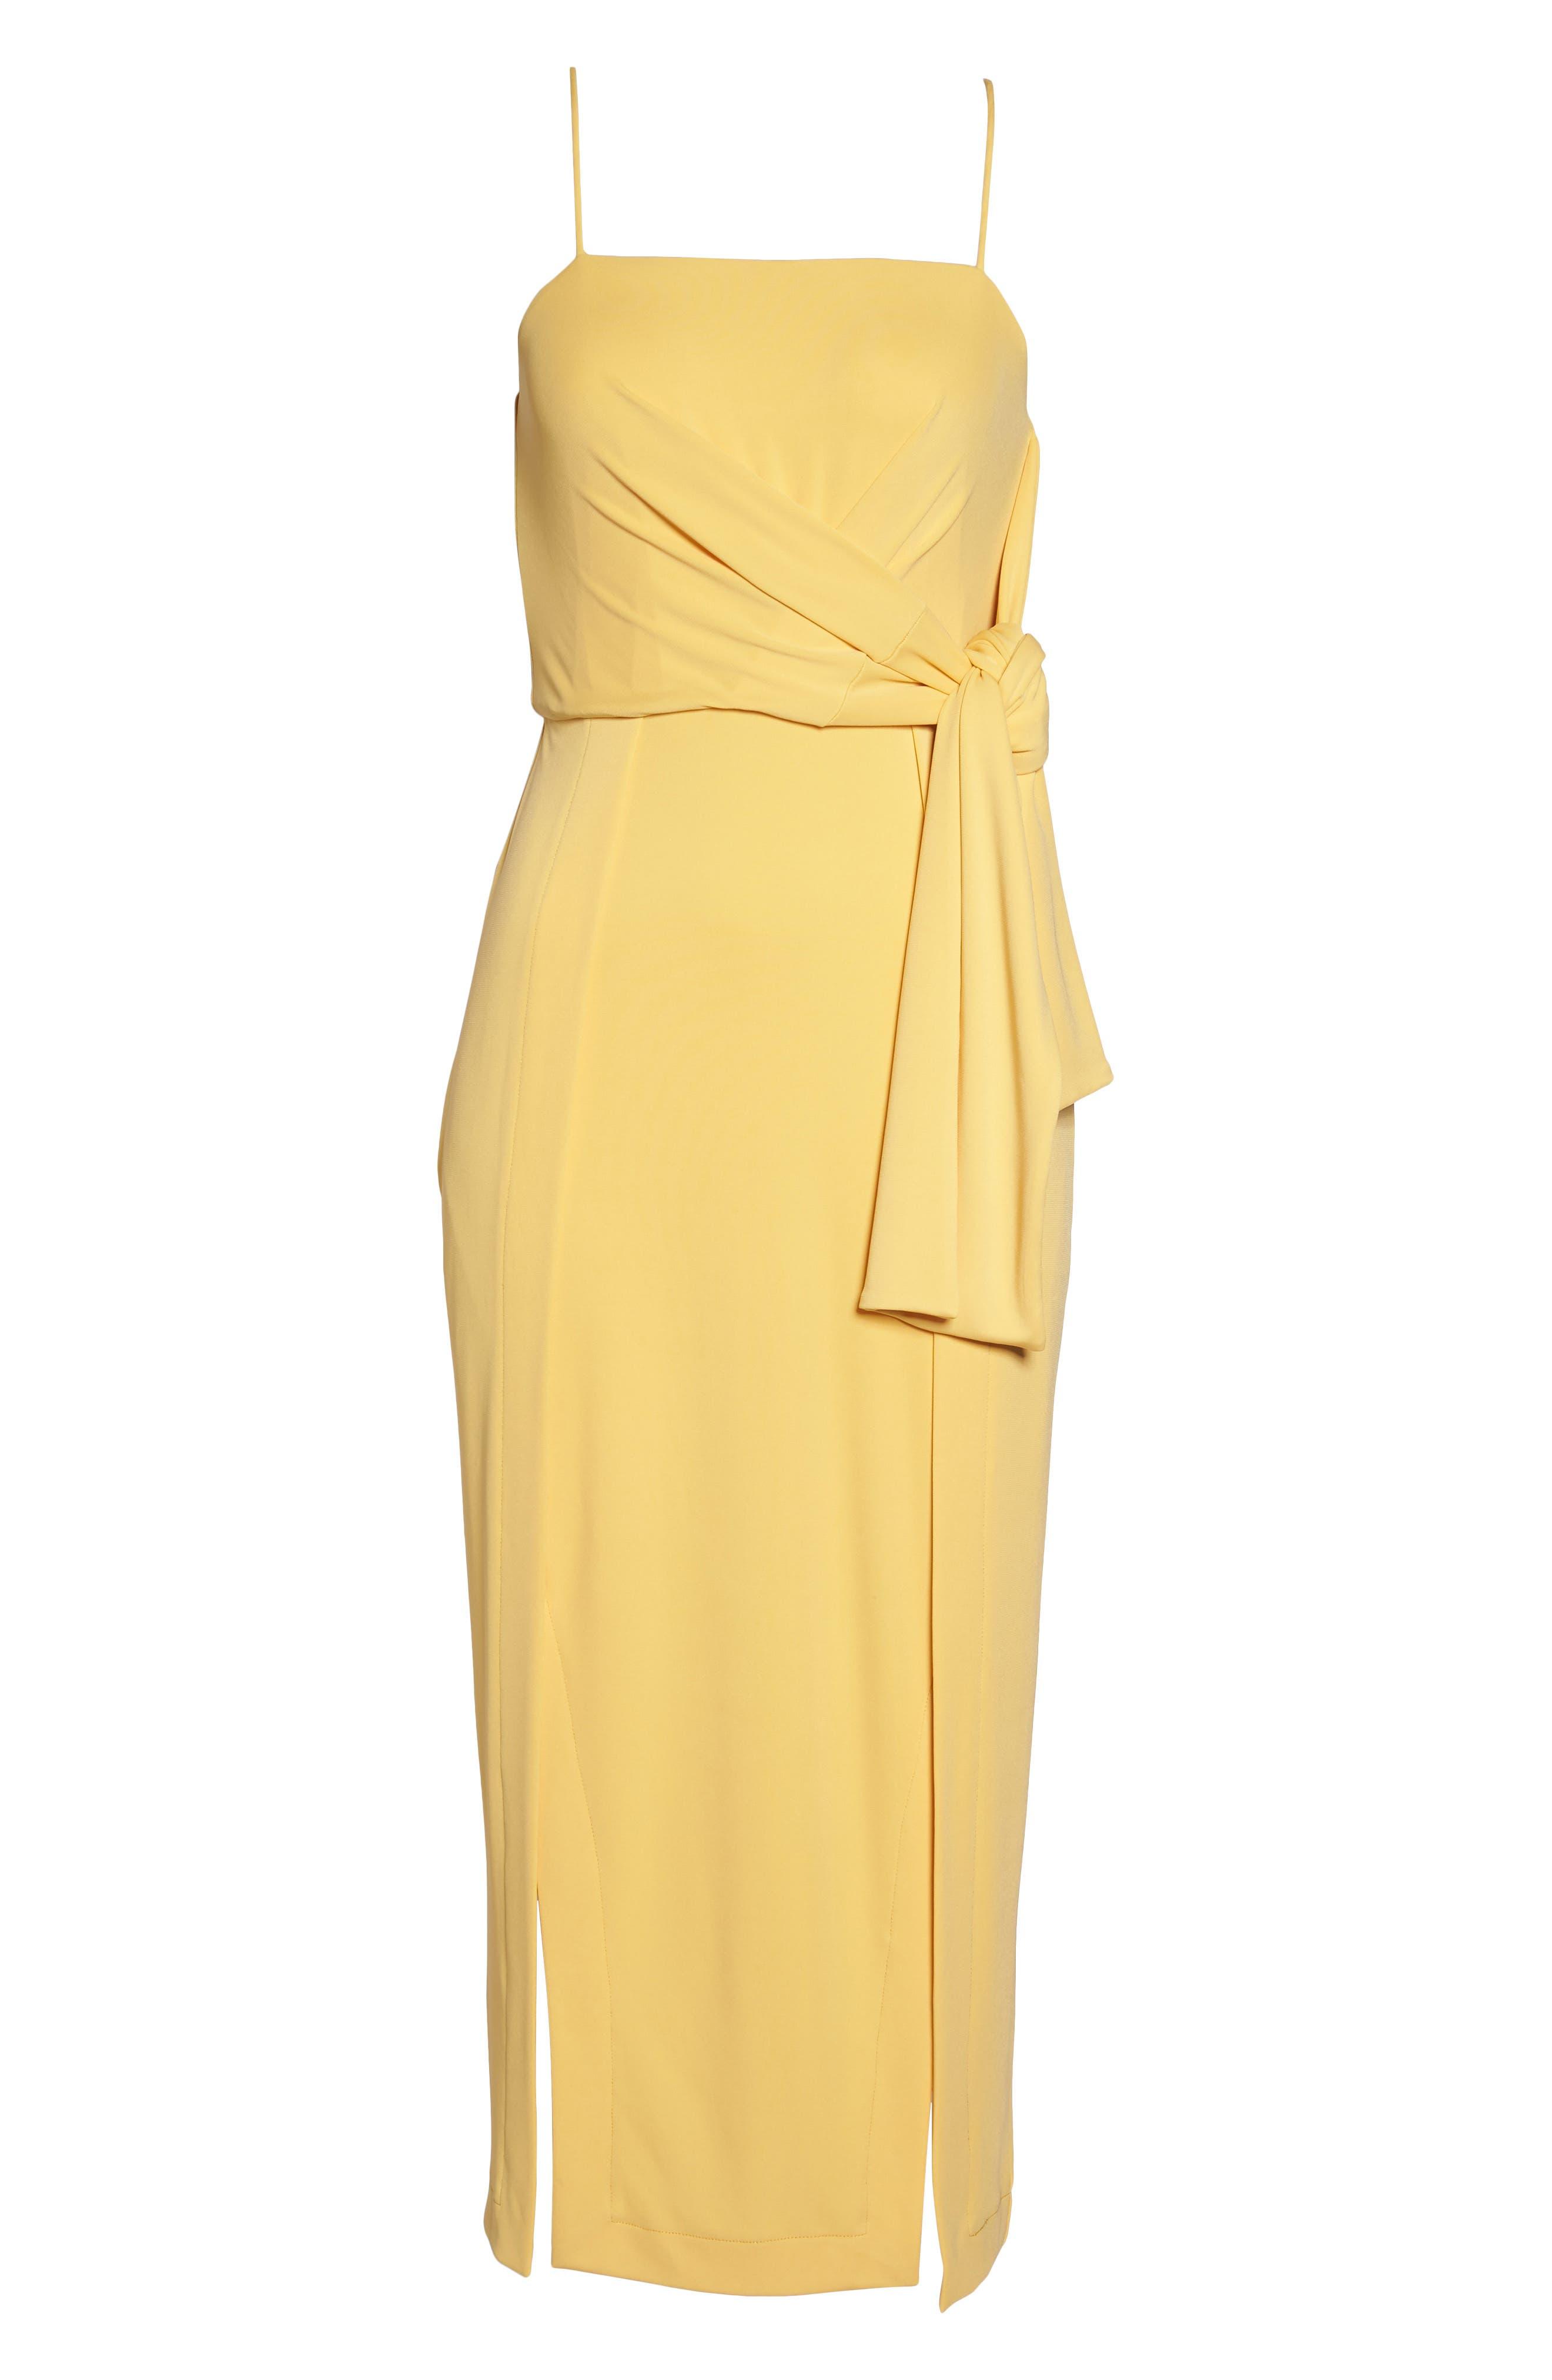 Recollect Slinky Side Tie Midi Dress,                             Alternate thumbnail 6, color,                             Honey